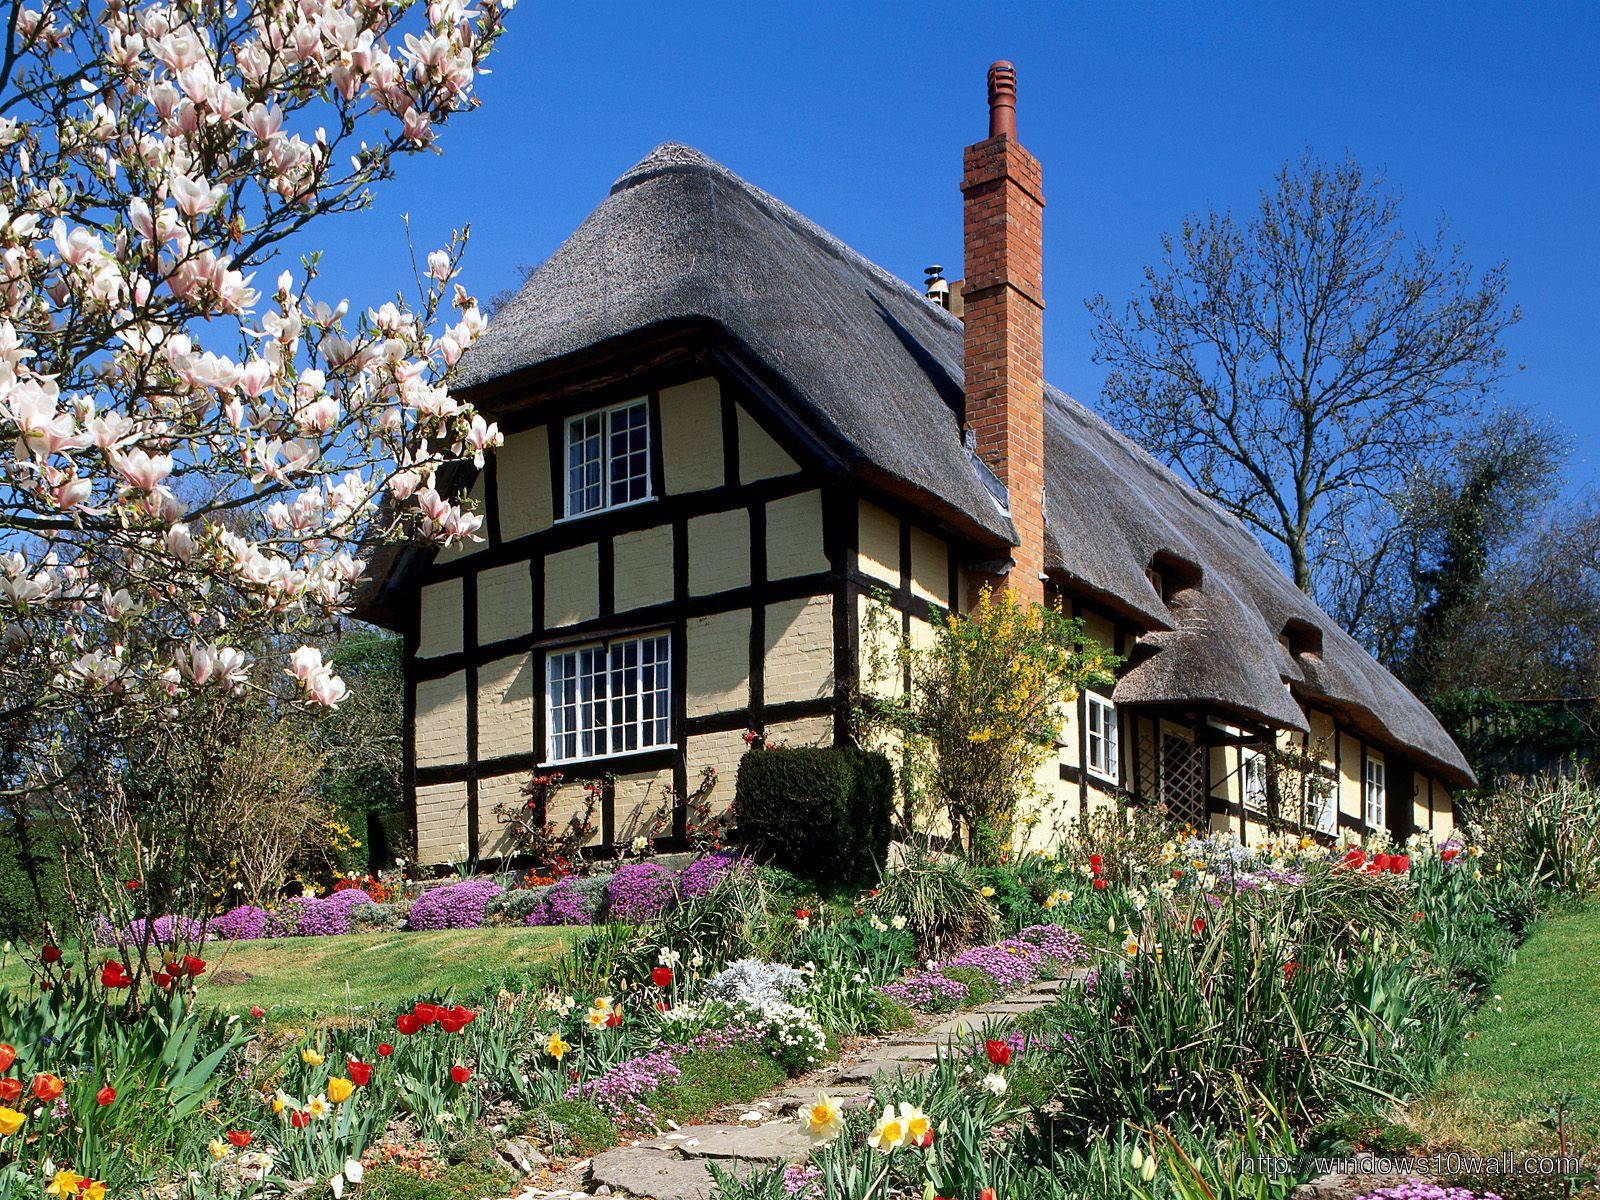 spring-garden-england-background-wallpaper